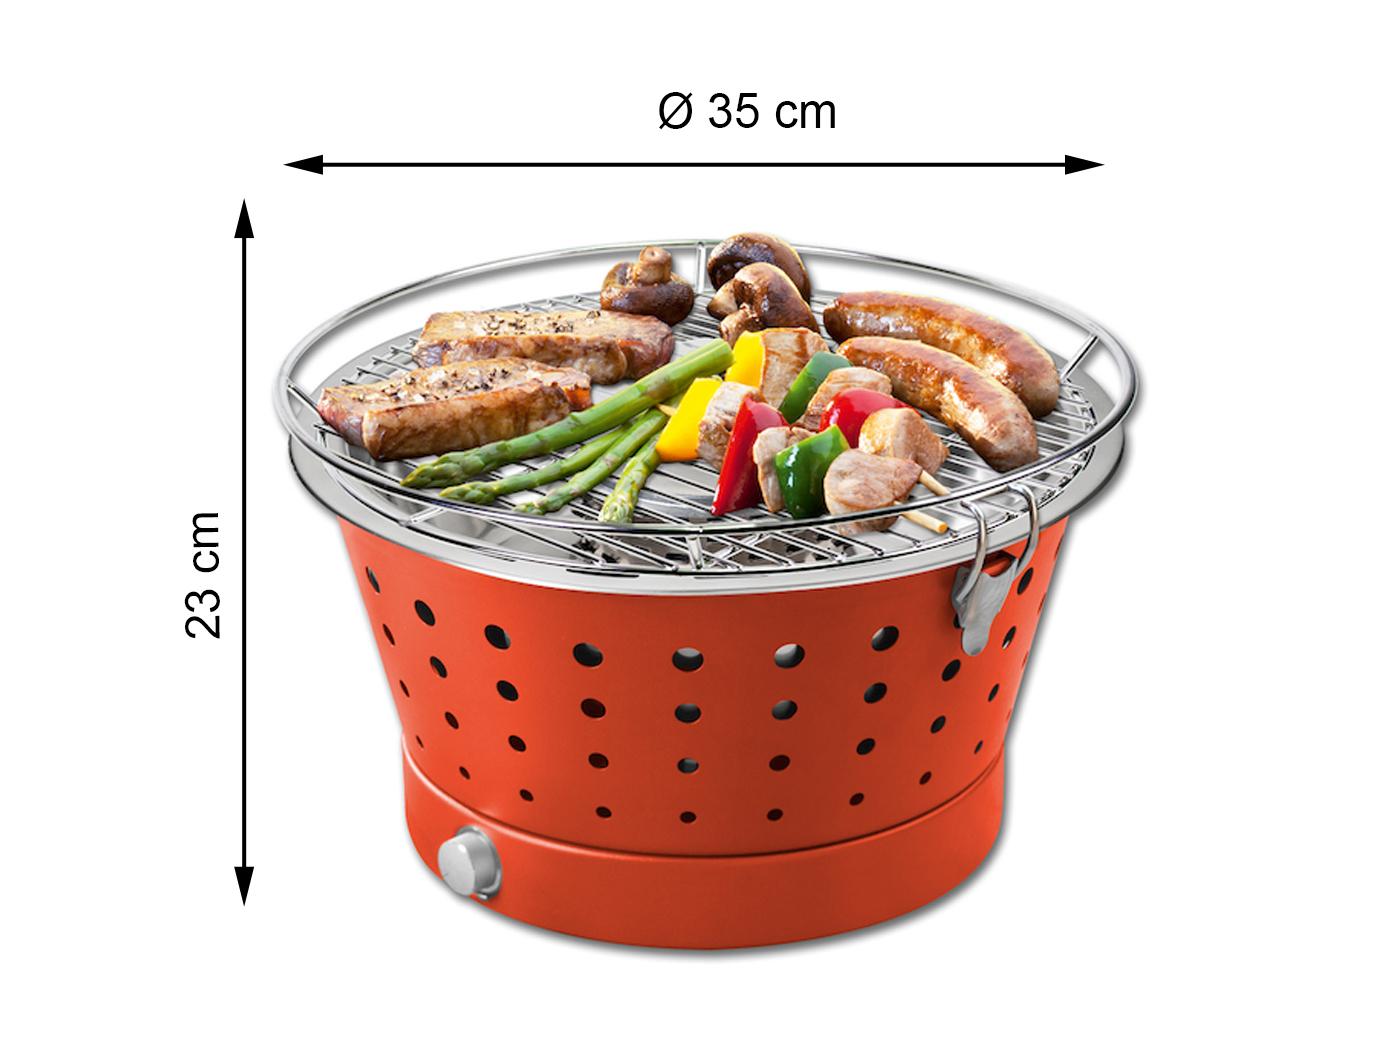 grill mit l fter test vergleich grill mit l fter g nstig kaufen. Black Bedroom Furniture Sets. Home Design Ideas